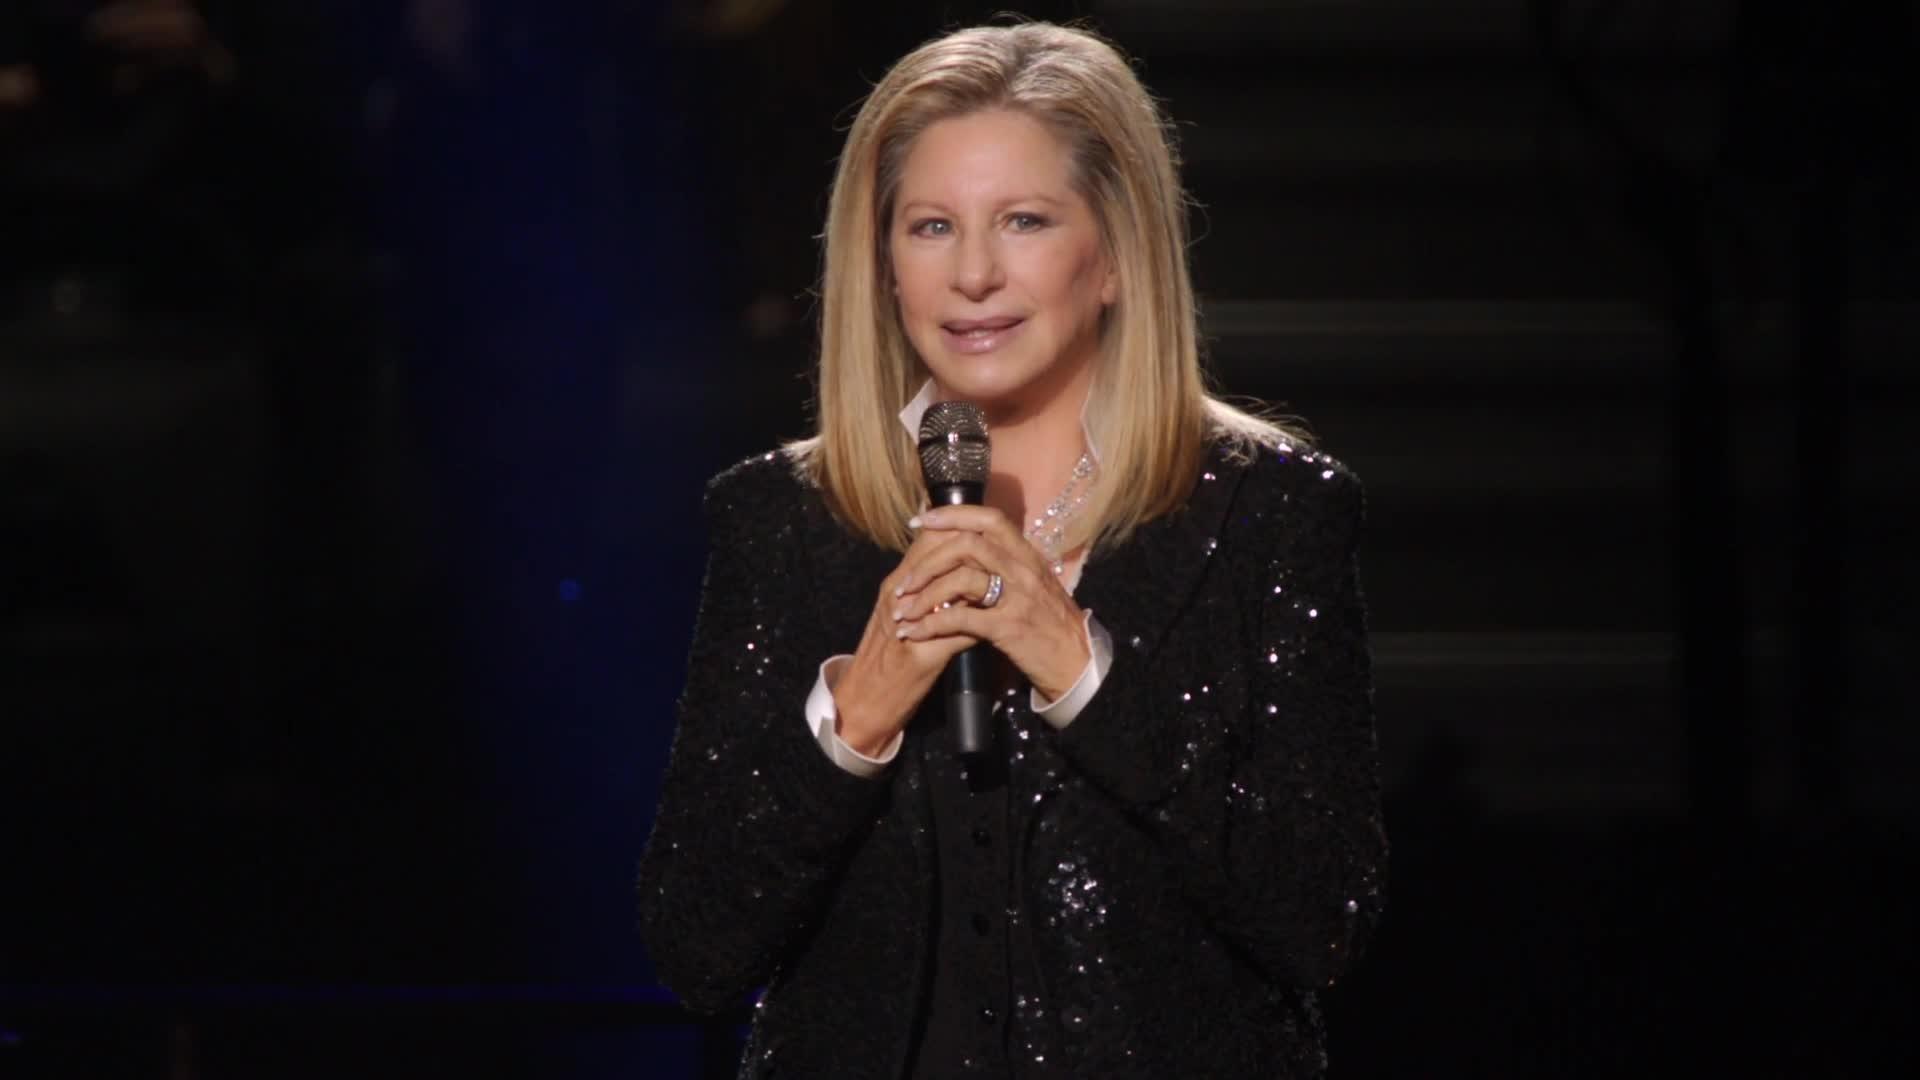 Pictures Of Barbra Streisand